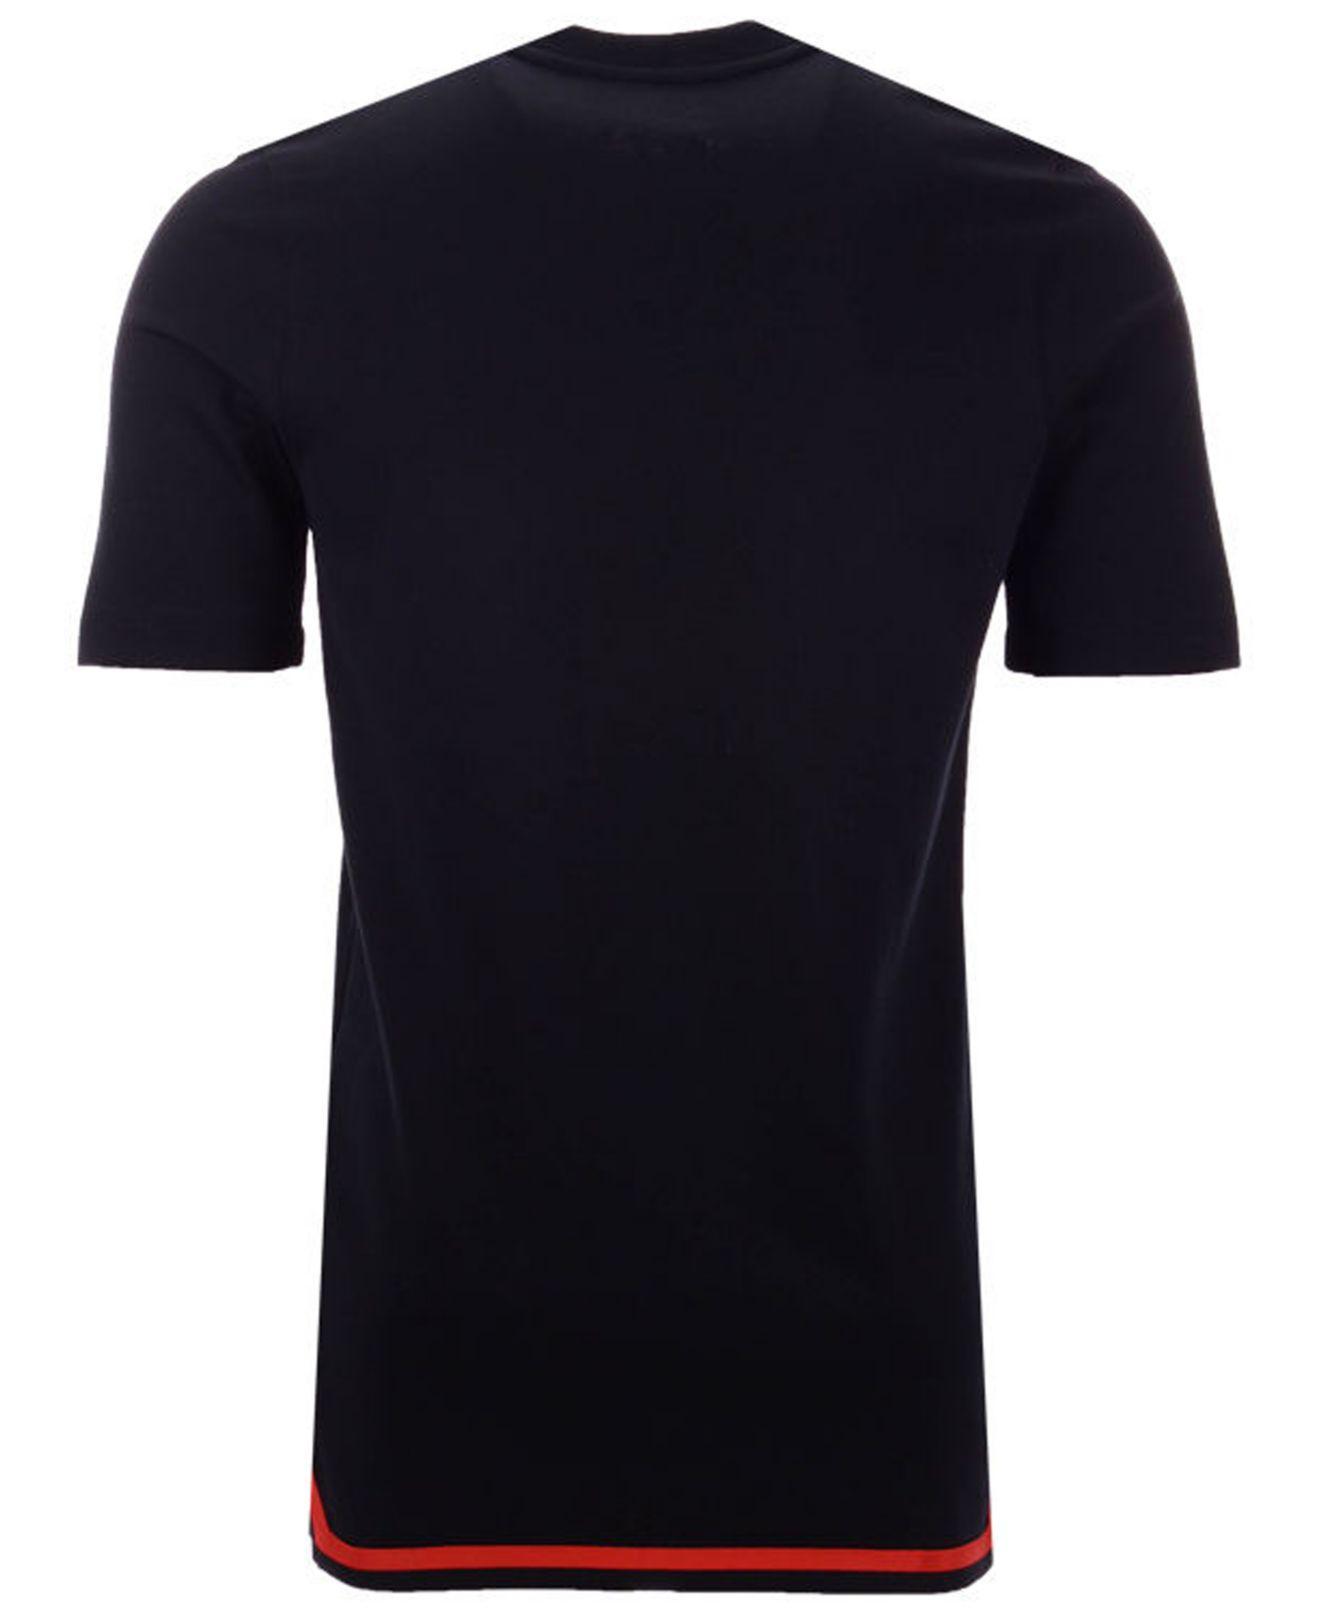 9379cb3497e Nike Portland Trail Blazers City Edition Shooting T-shirt in Black for Men  - Lyst